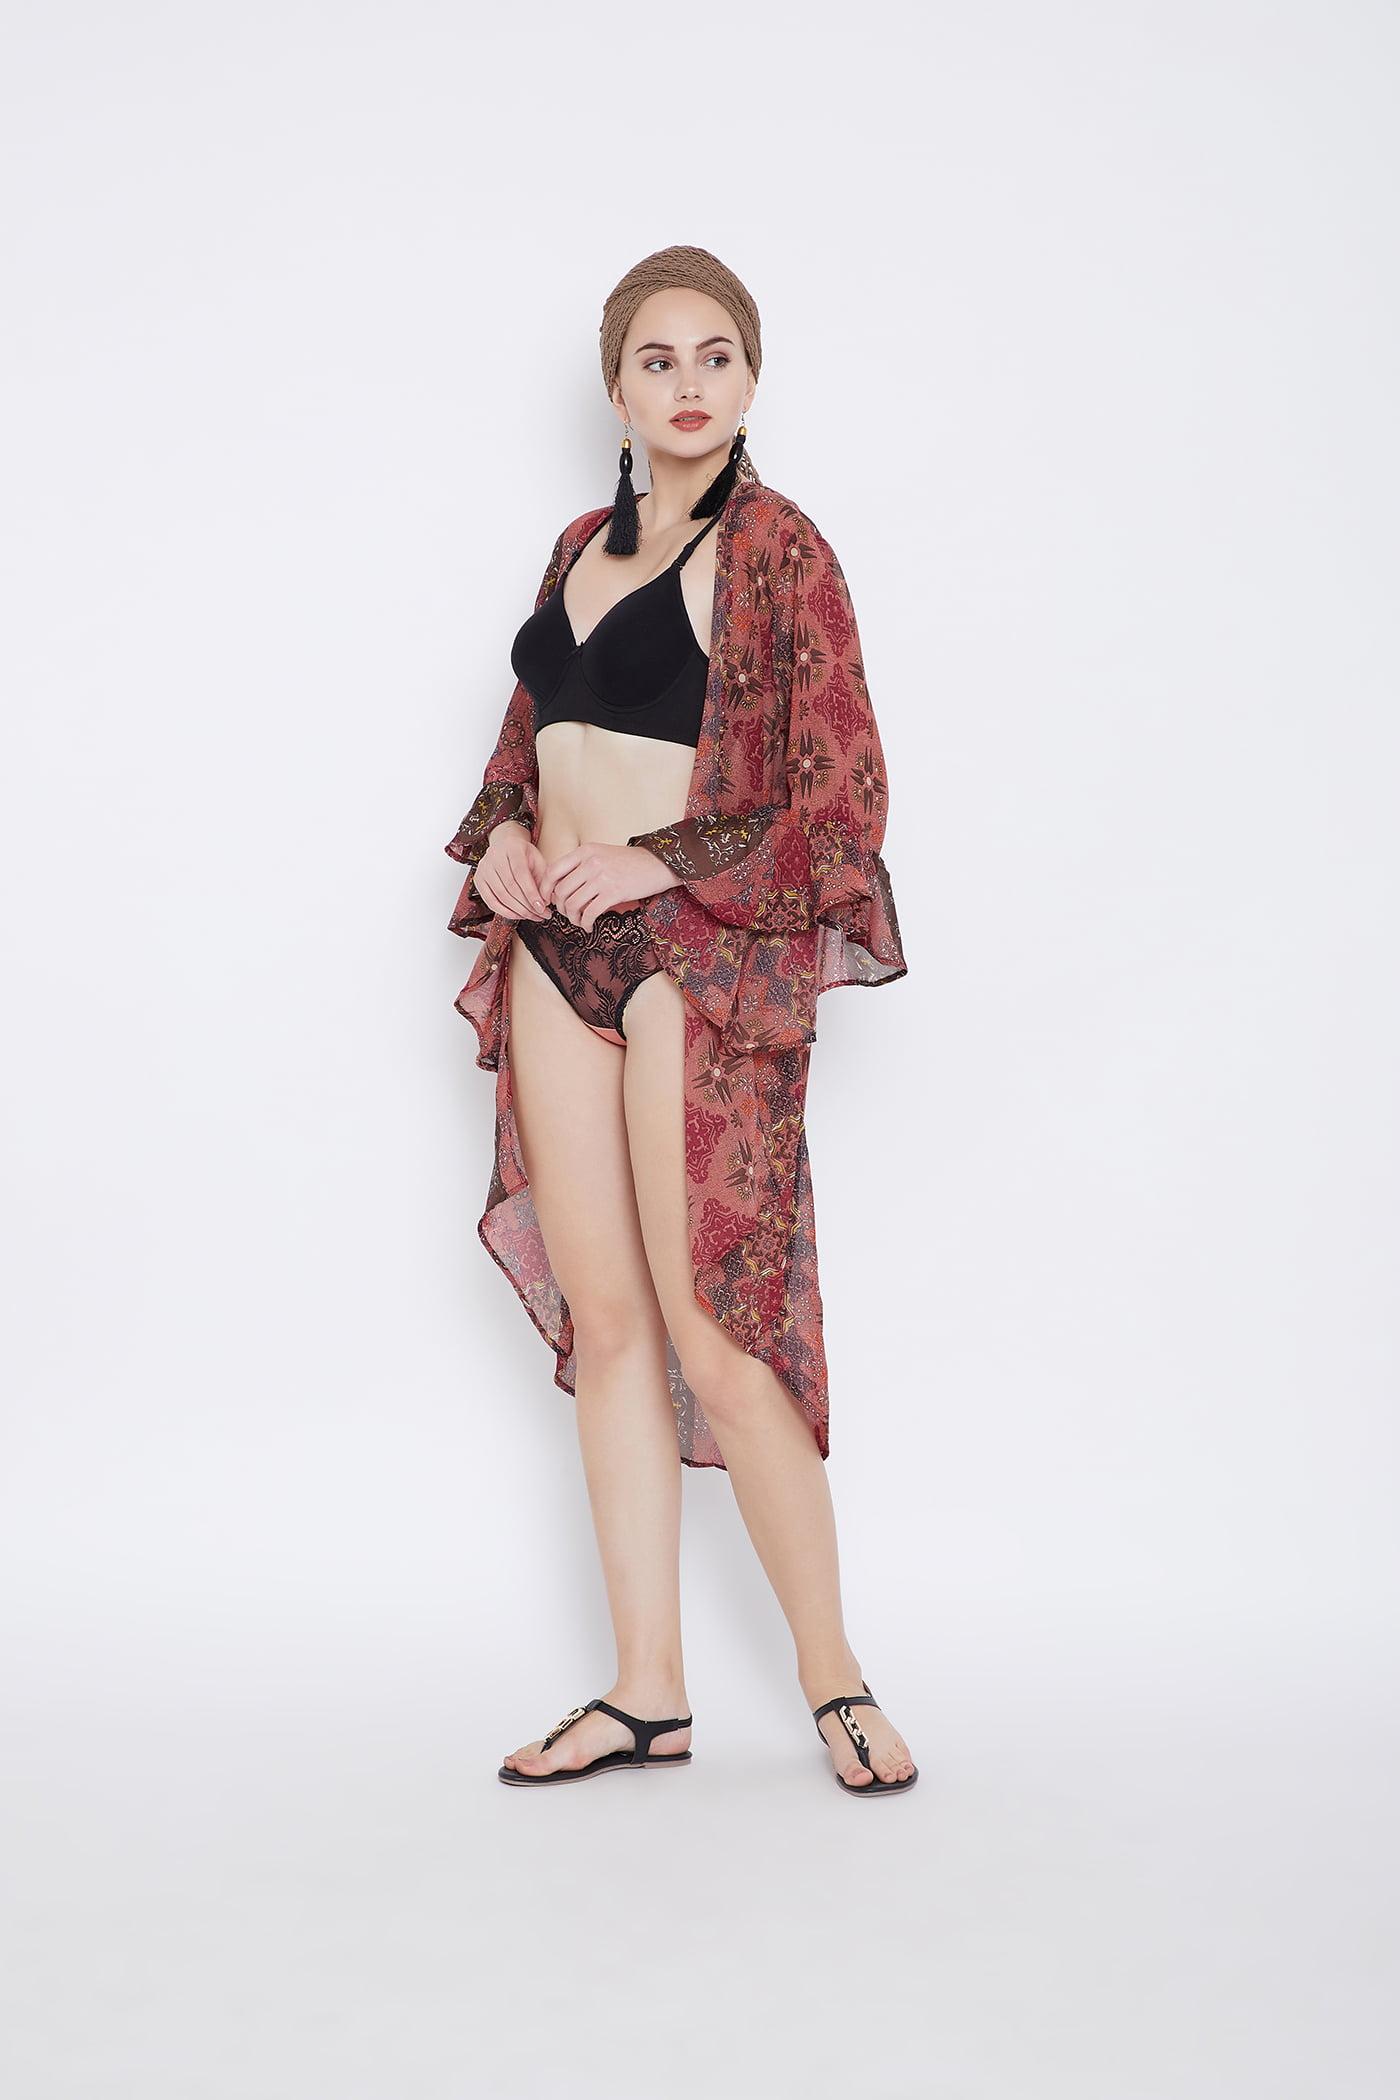 d6cd82d8f180d Oussum - Canyon Rose Beach Cover Ups for Women Beach Swimsuit Digital  Printed Bikini Cover Up Kimono Sleeve Summer Beach Dresses for Women Plus  Size Bathing ...